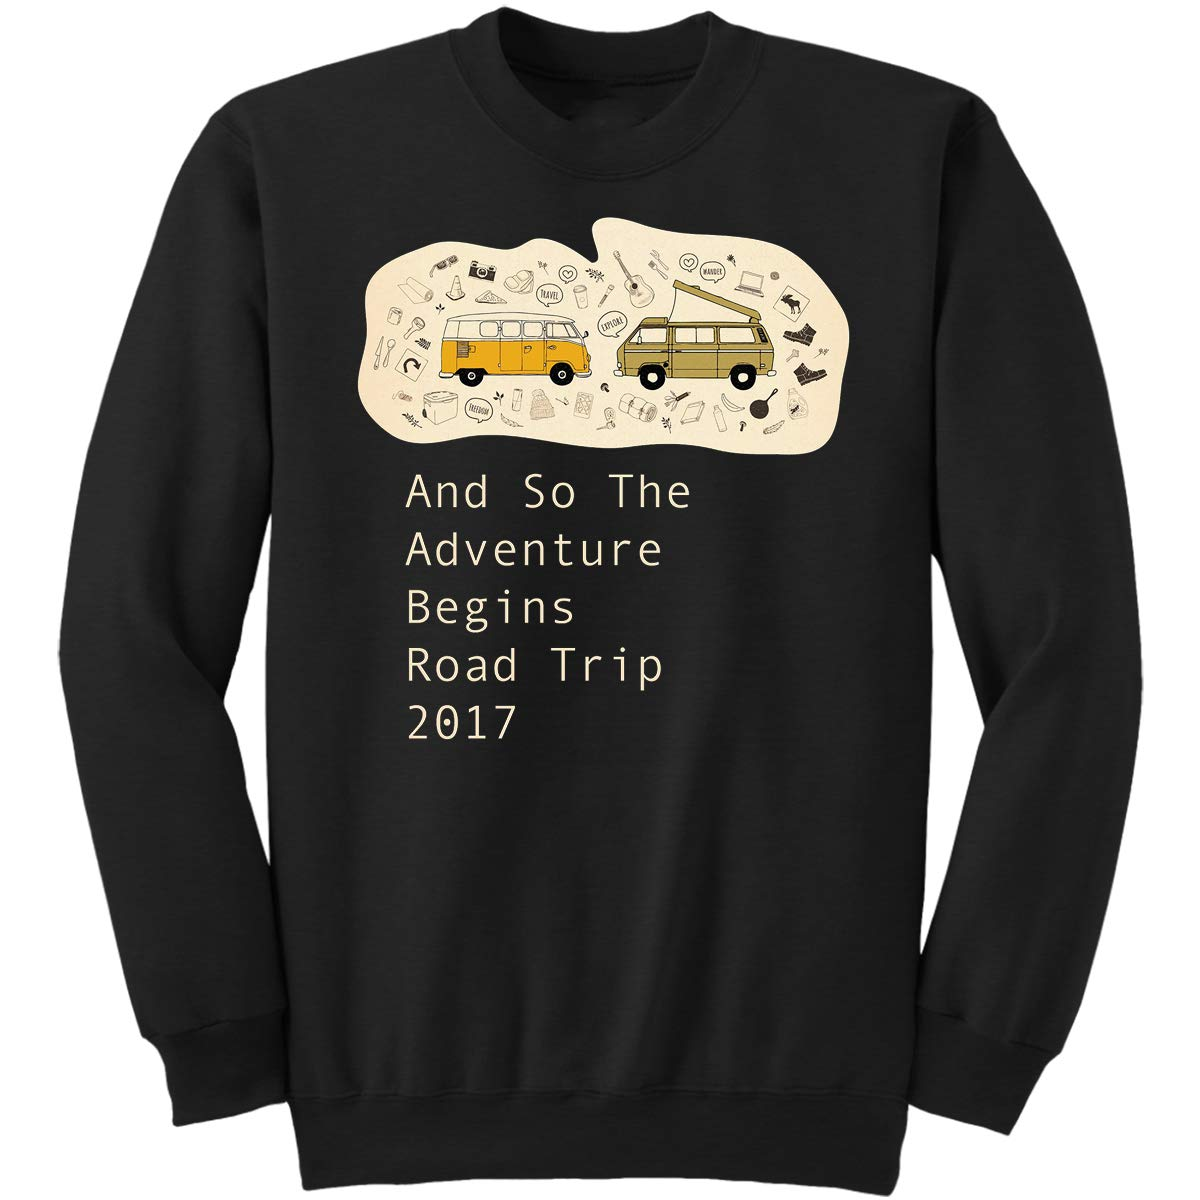 DoozyGifts99 So The Adventure Begins Road Trip 2 Sweatshirt